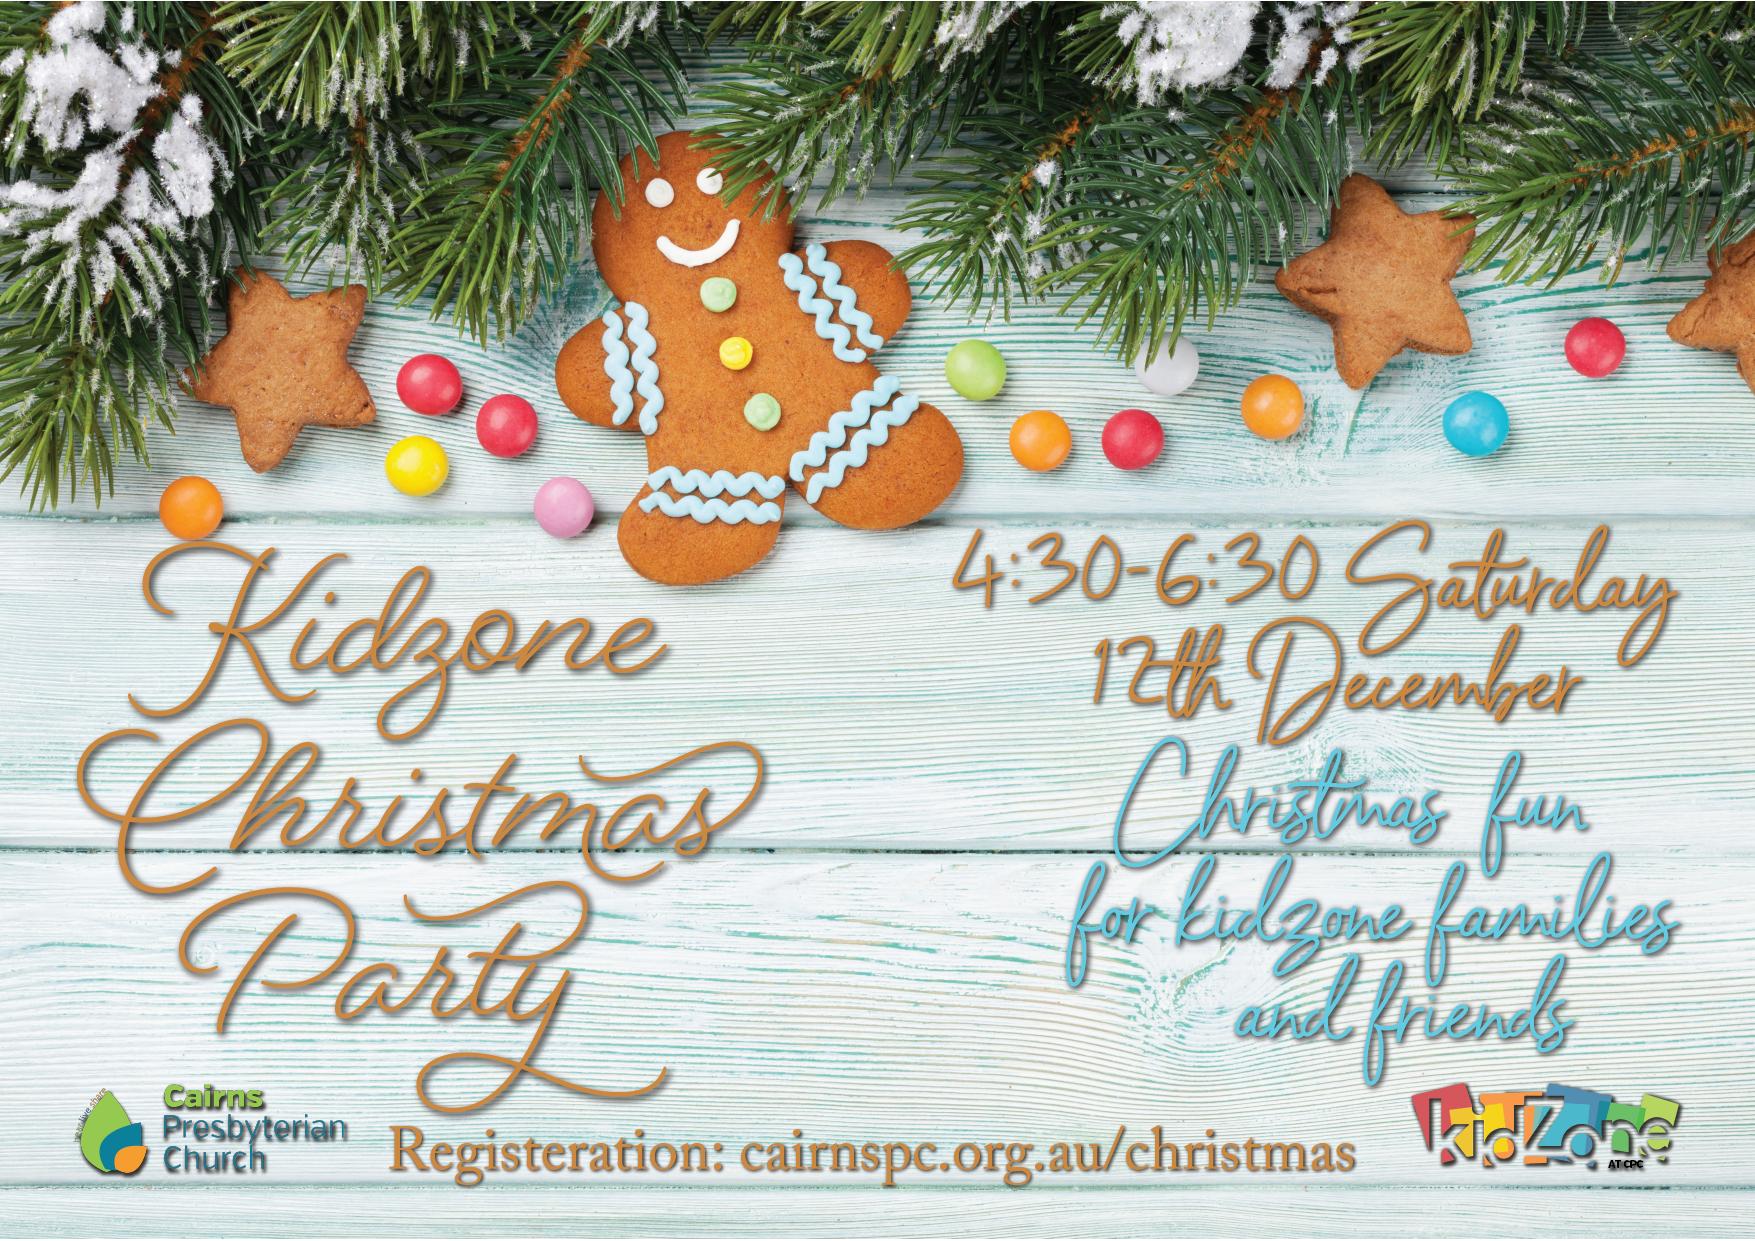 Kidzone Christmas Fair